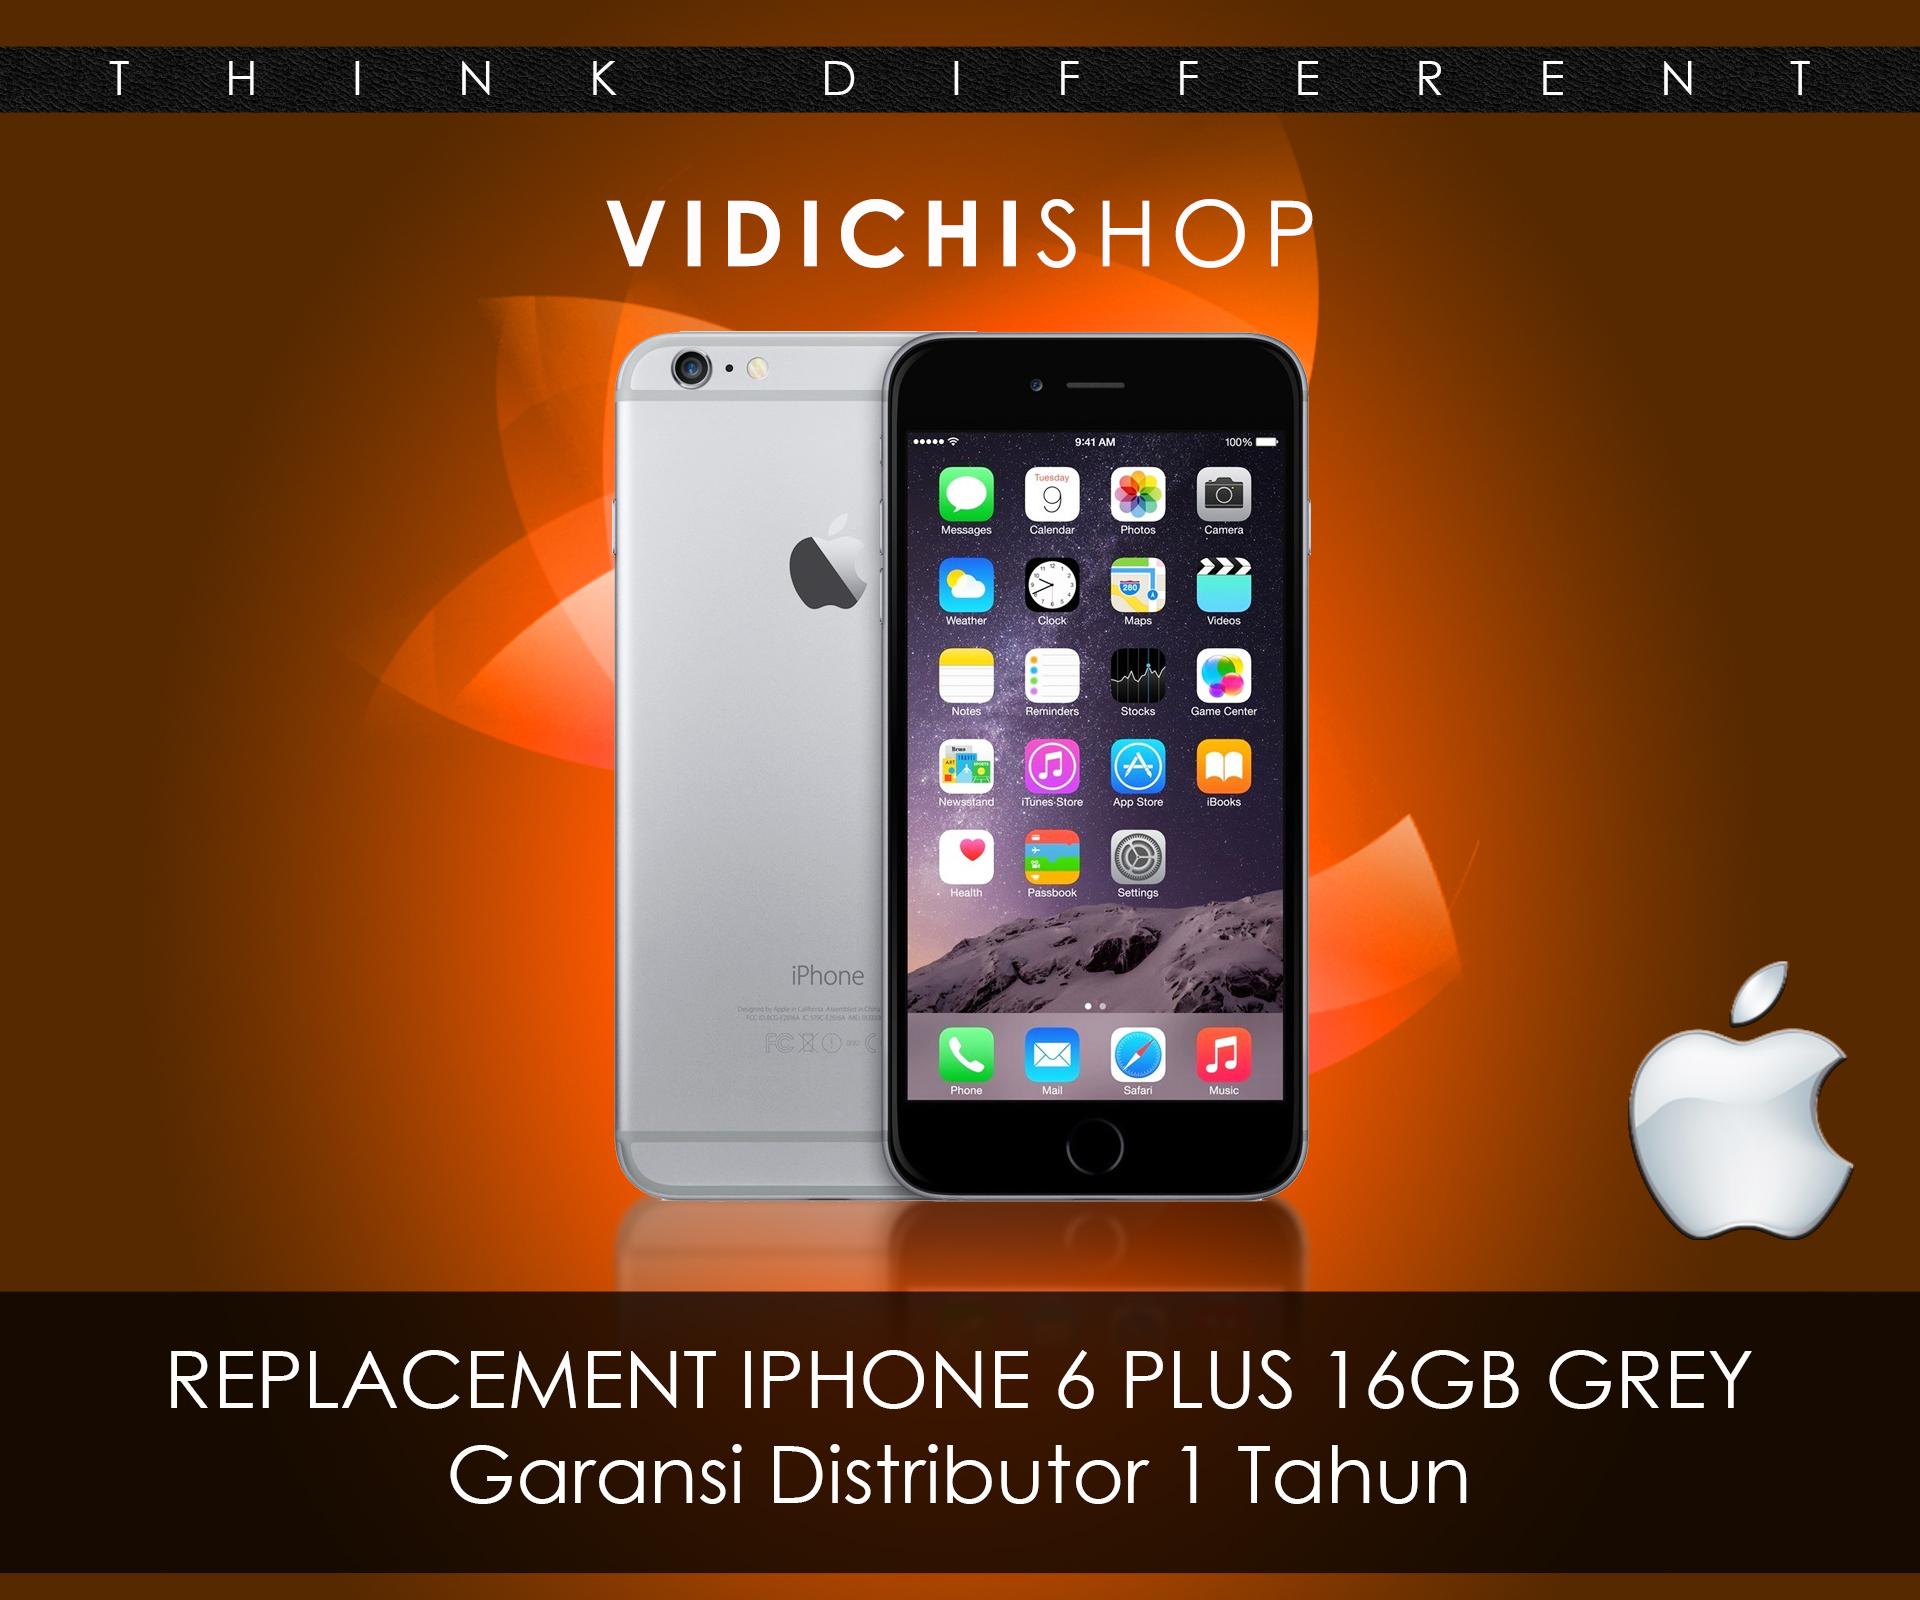 Jual REPLACEMENT Iphone 6 PLUS 16GB GREY Garansi Distributor 1 Tahun Vidichishop